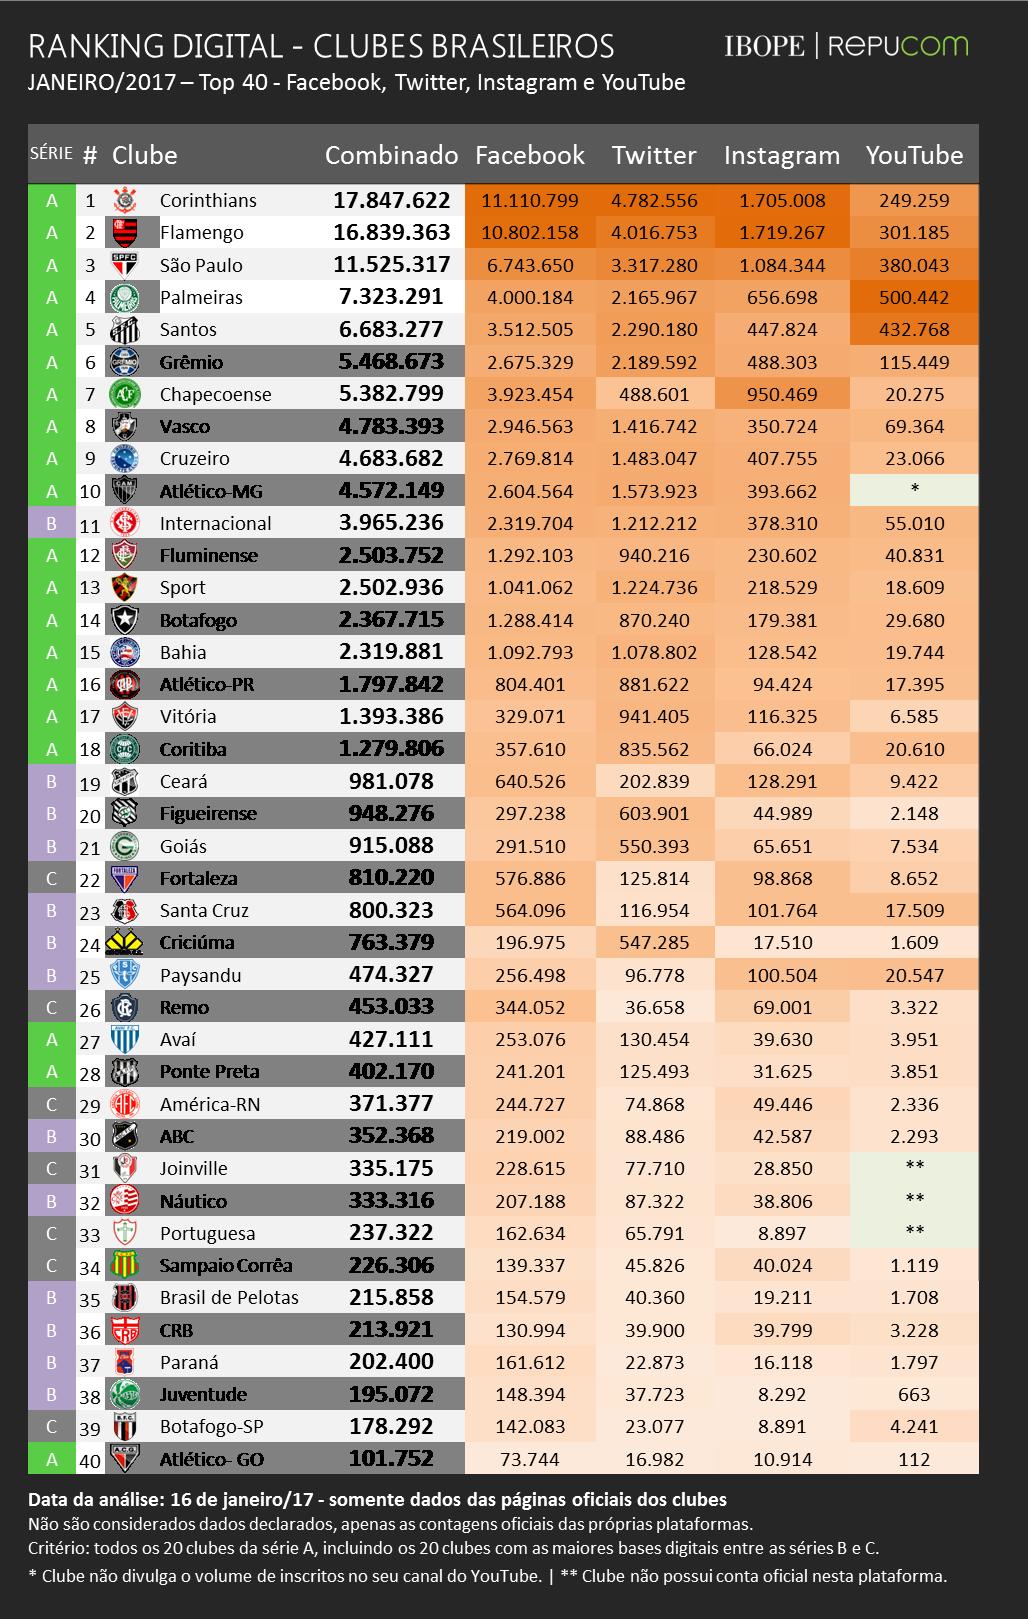 Tabela de times populares nas redes